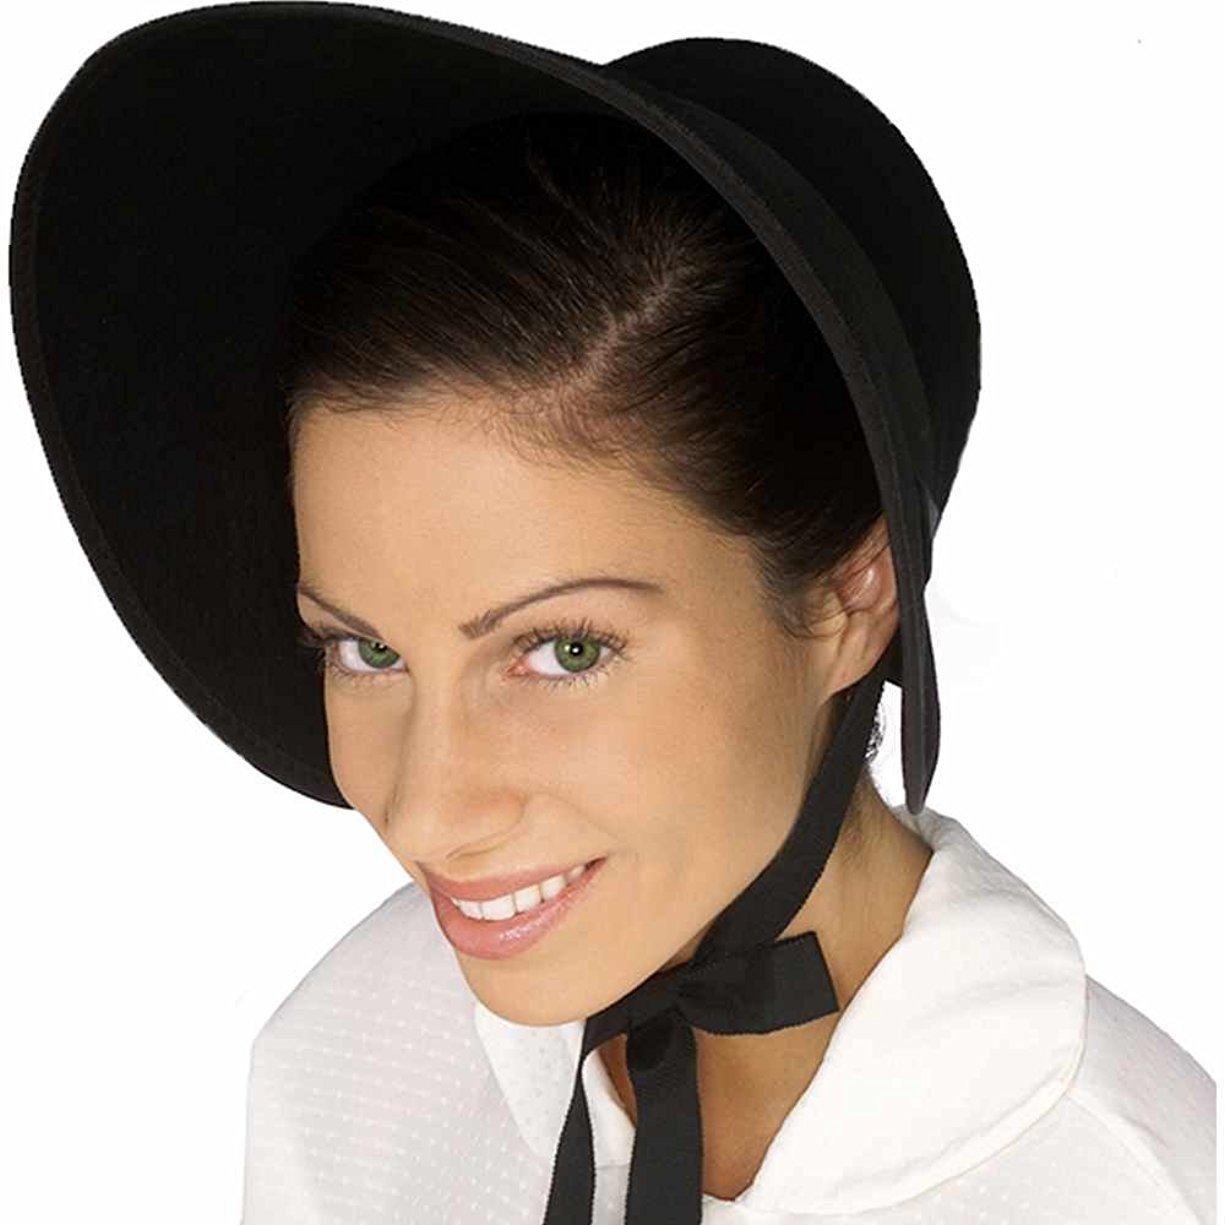 e80f44e6a15f9 The perfect accessory to your next costume! includes one black felt bonnet